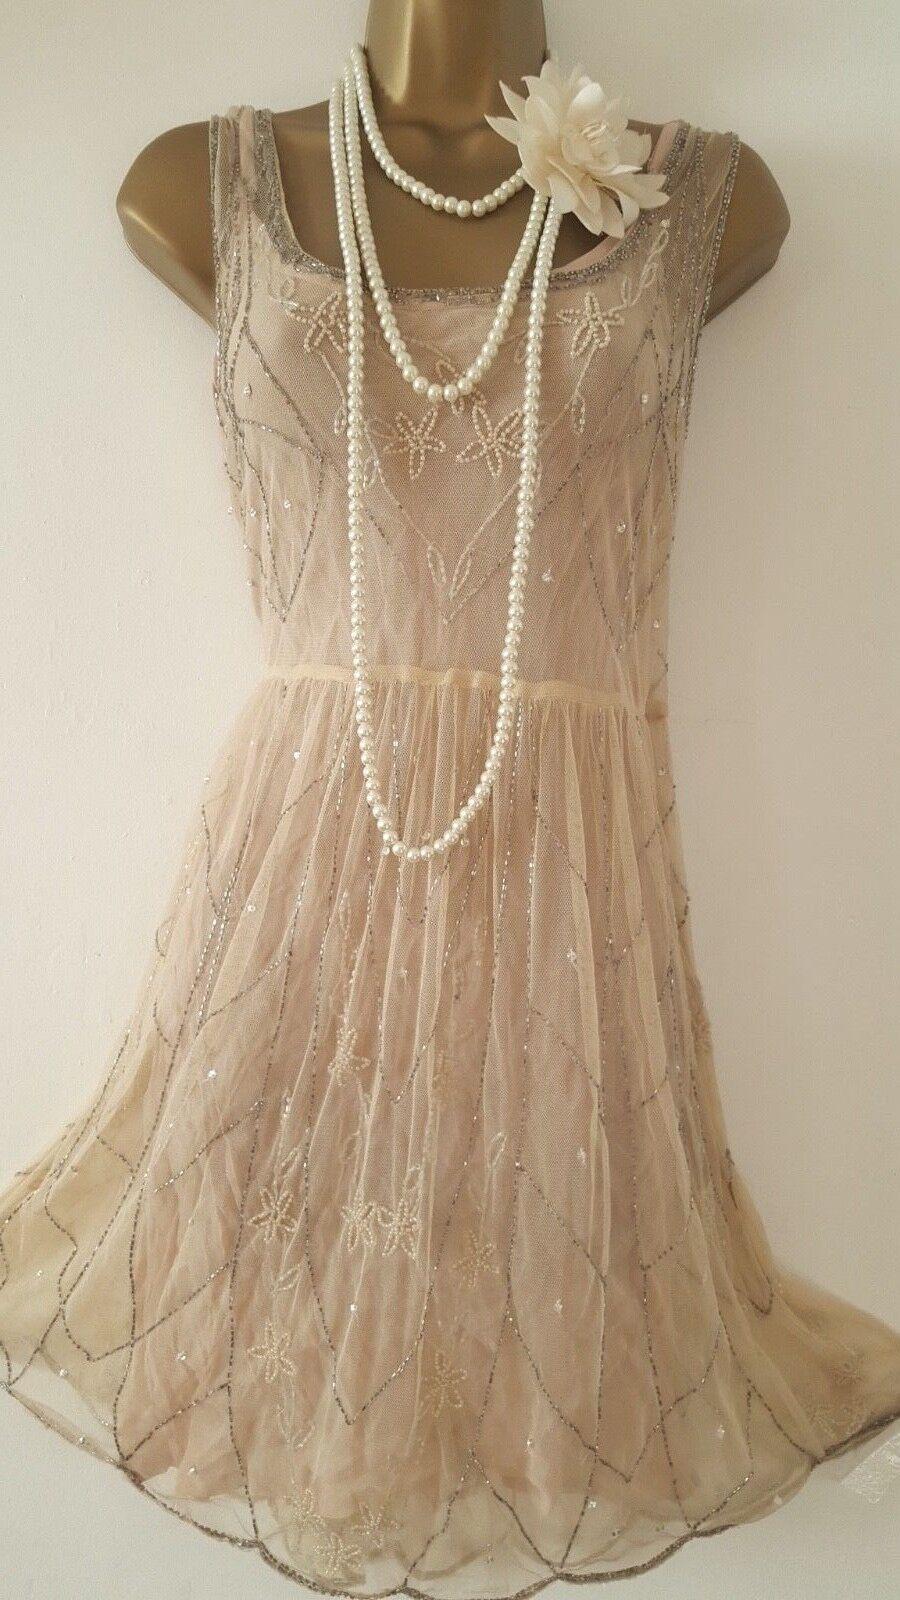 NEWLOOK 20'S STYLE GATSBY FLAPPER CHARLESTON DECO SEQUIN BEAD DRESS Größe UK16